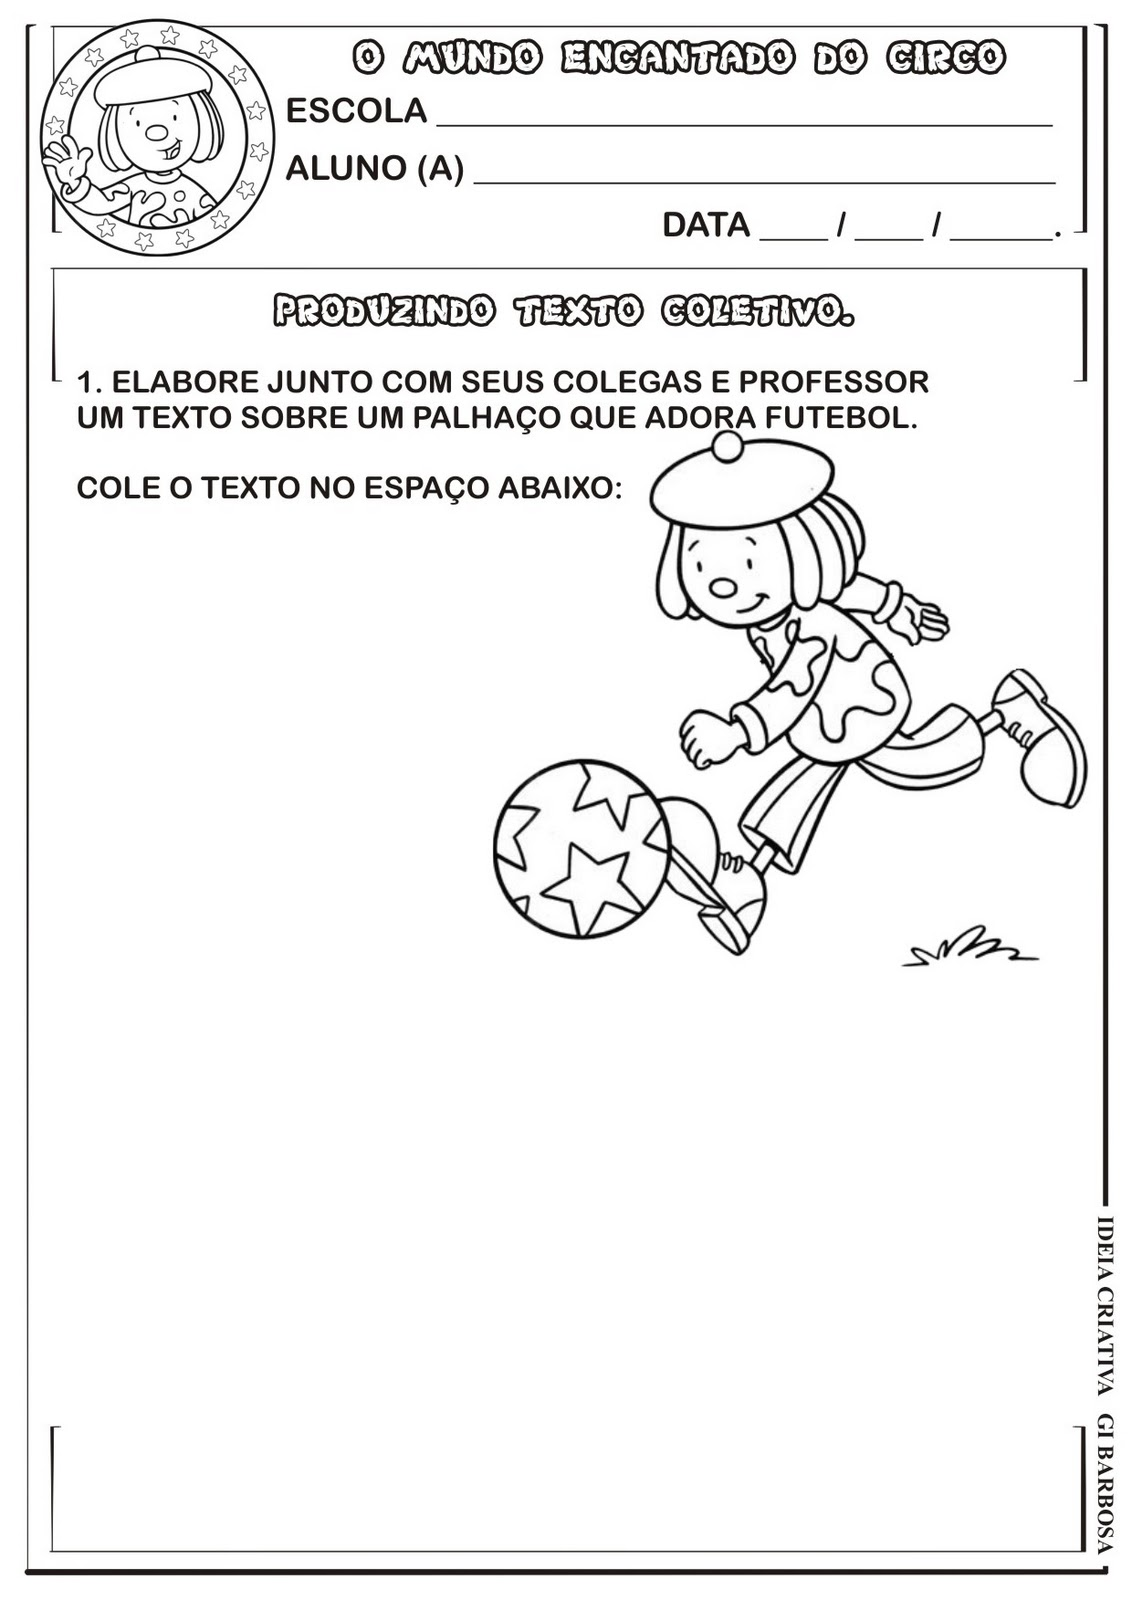 Projeto Circo - Texto Coletivo